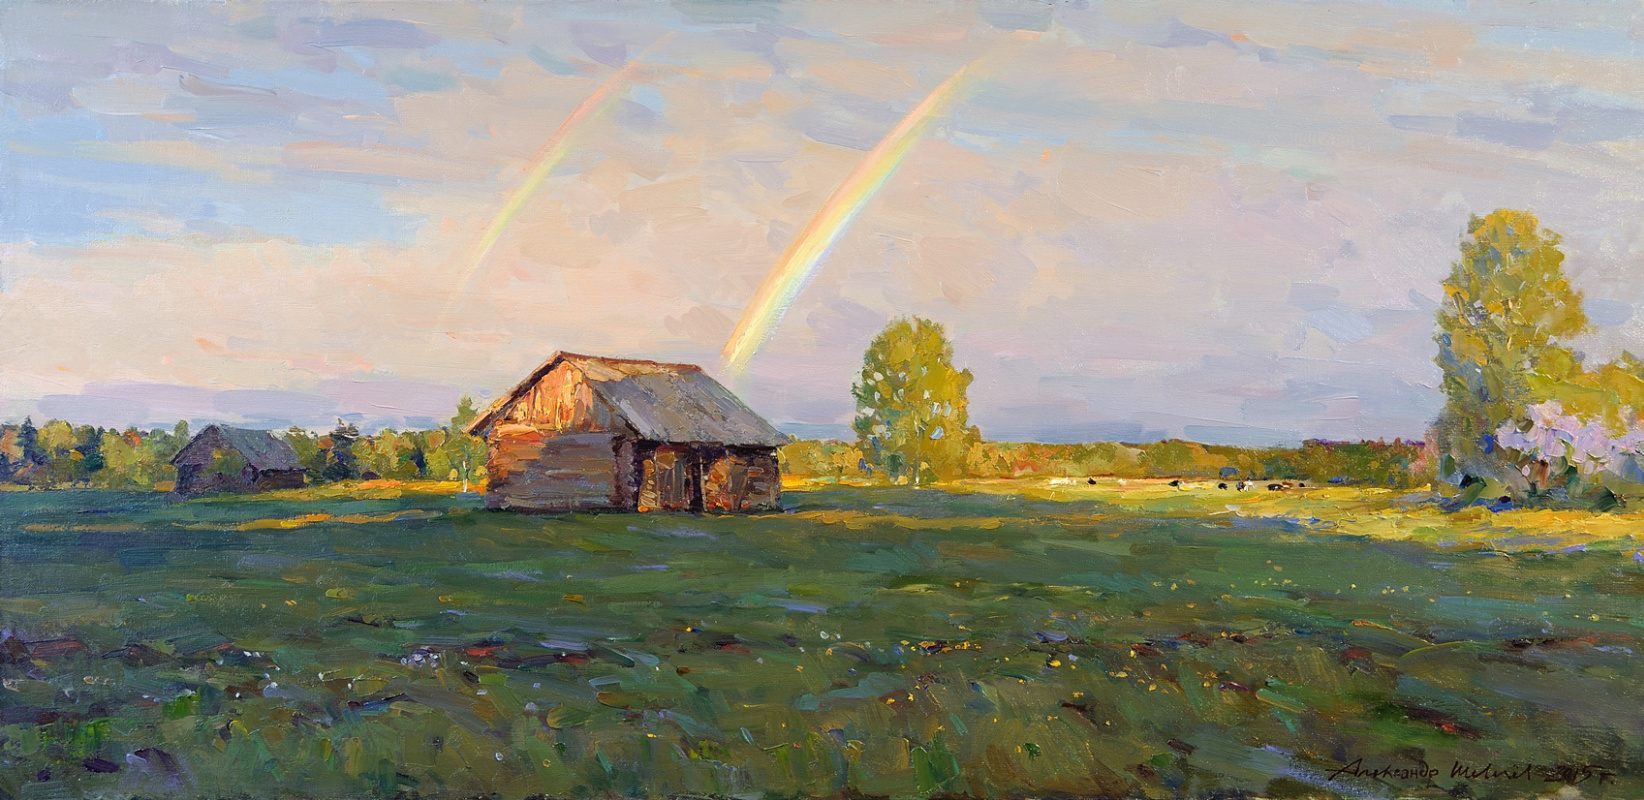 Alexander Victorovich Shevelyov. Summer evening. Oil on canvas 52.7 x 110 cm. 2015